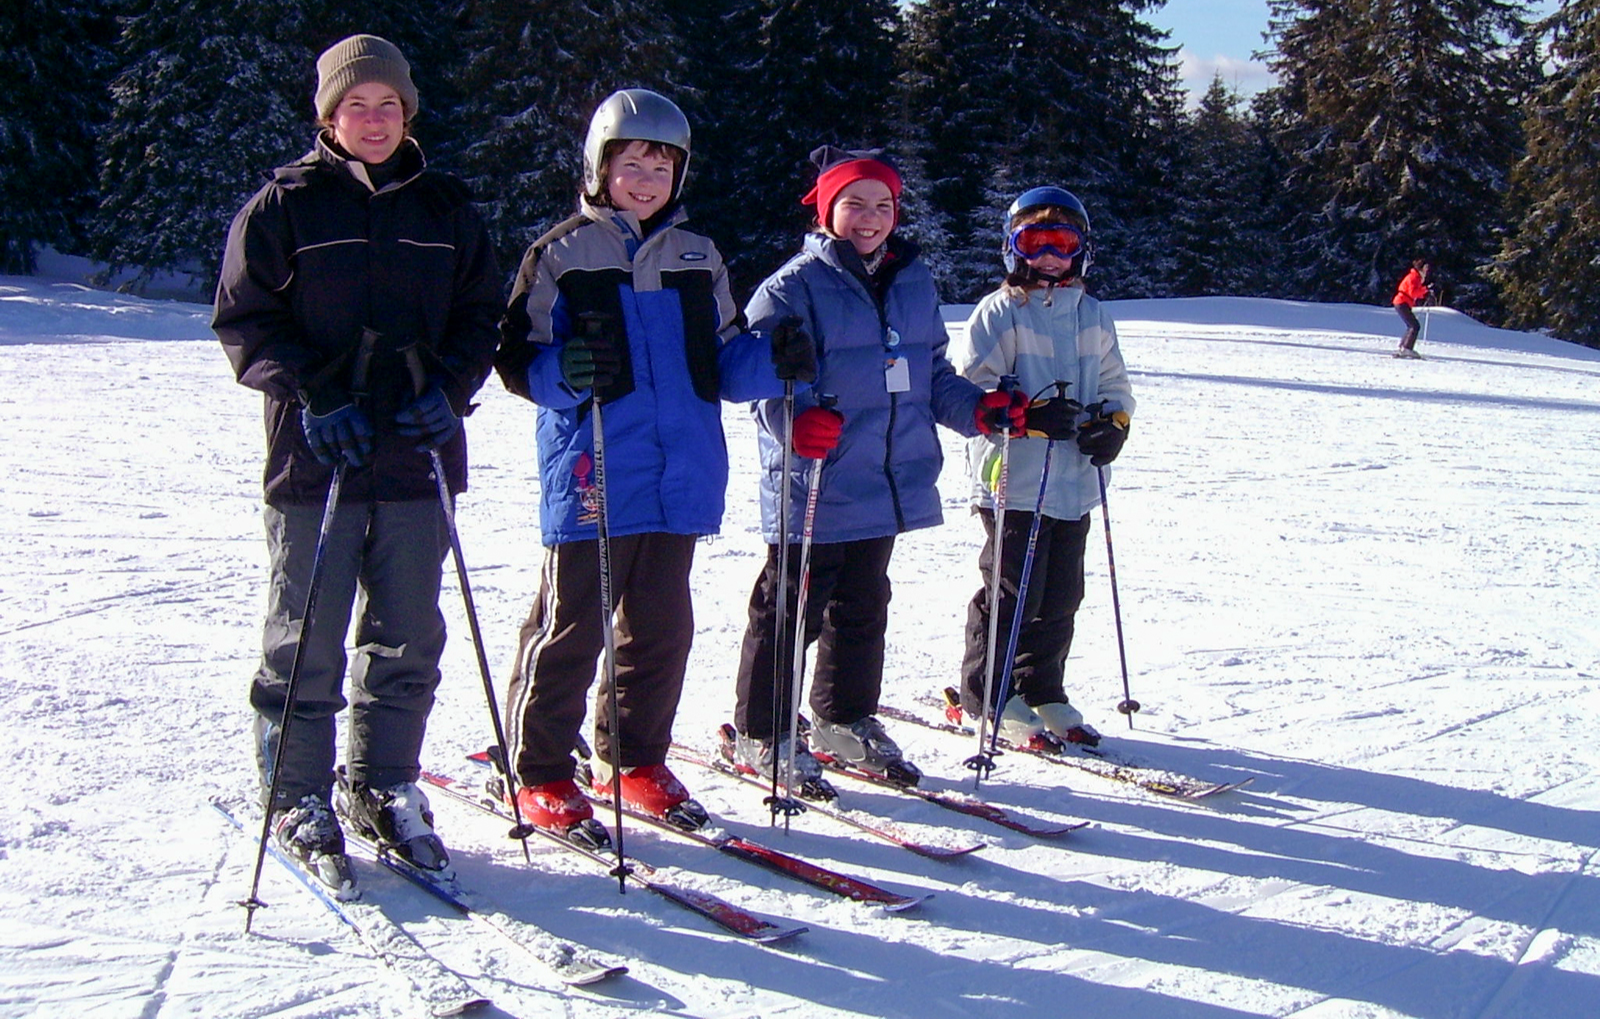 1-taegiger-skikurs-am-feldberg-bg4